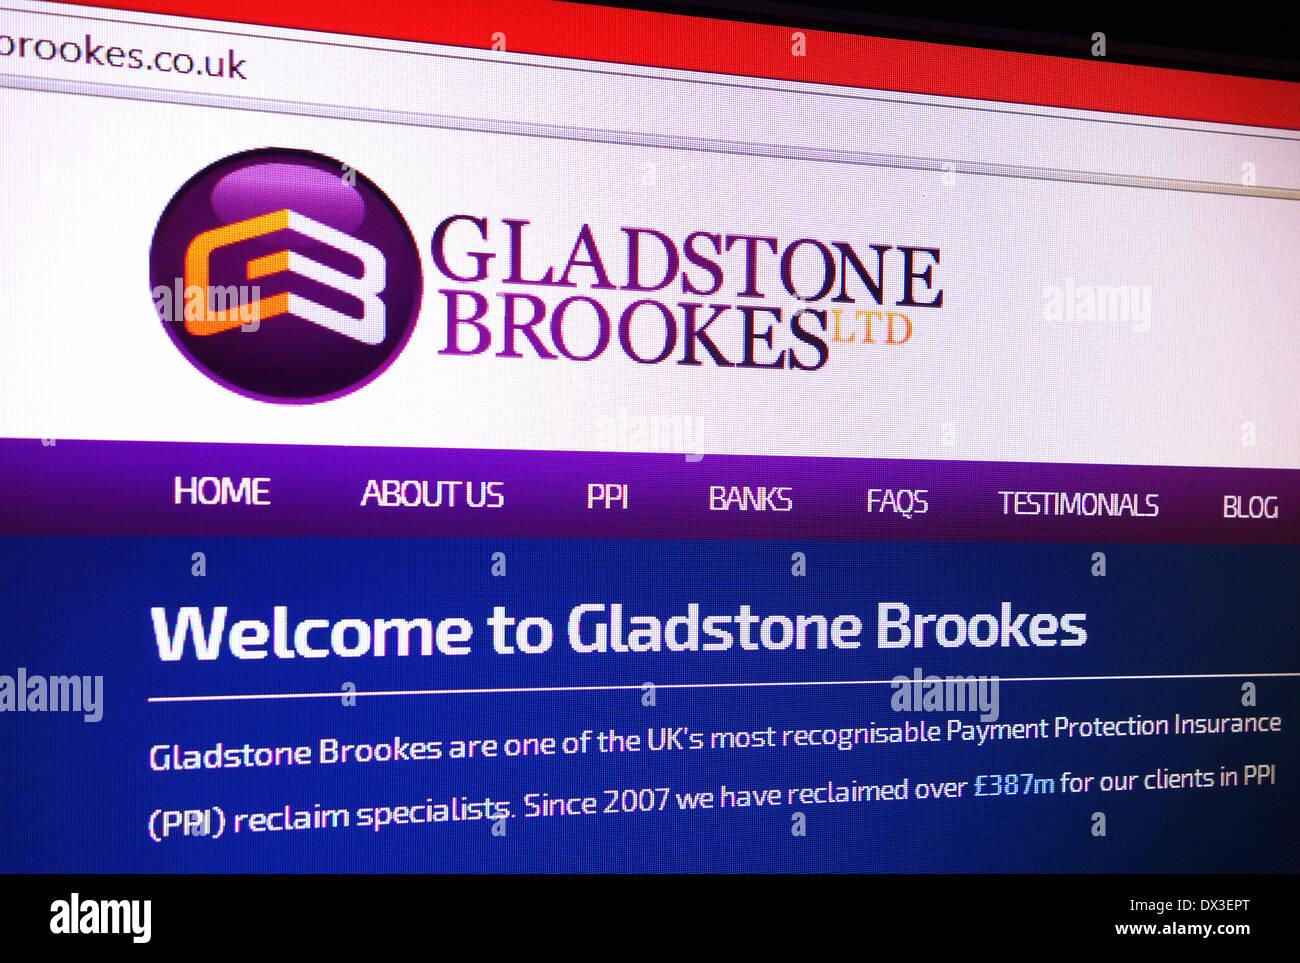 Ppi stock photos ppi stock images alamy gladstone brookes ltd ppi claims company website stock image spiritdancerdesigns Gallery